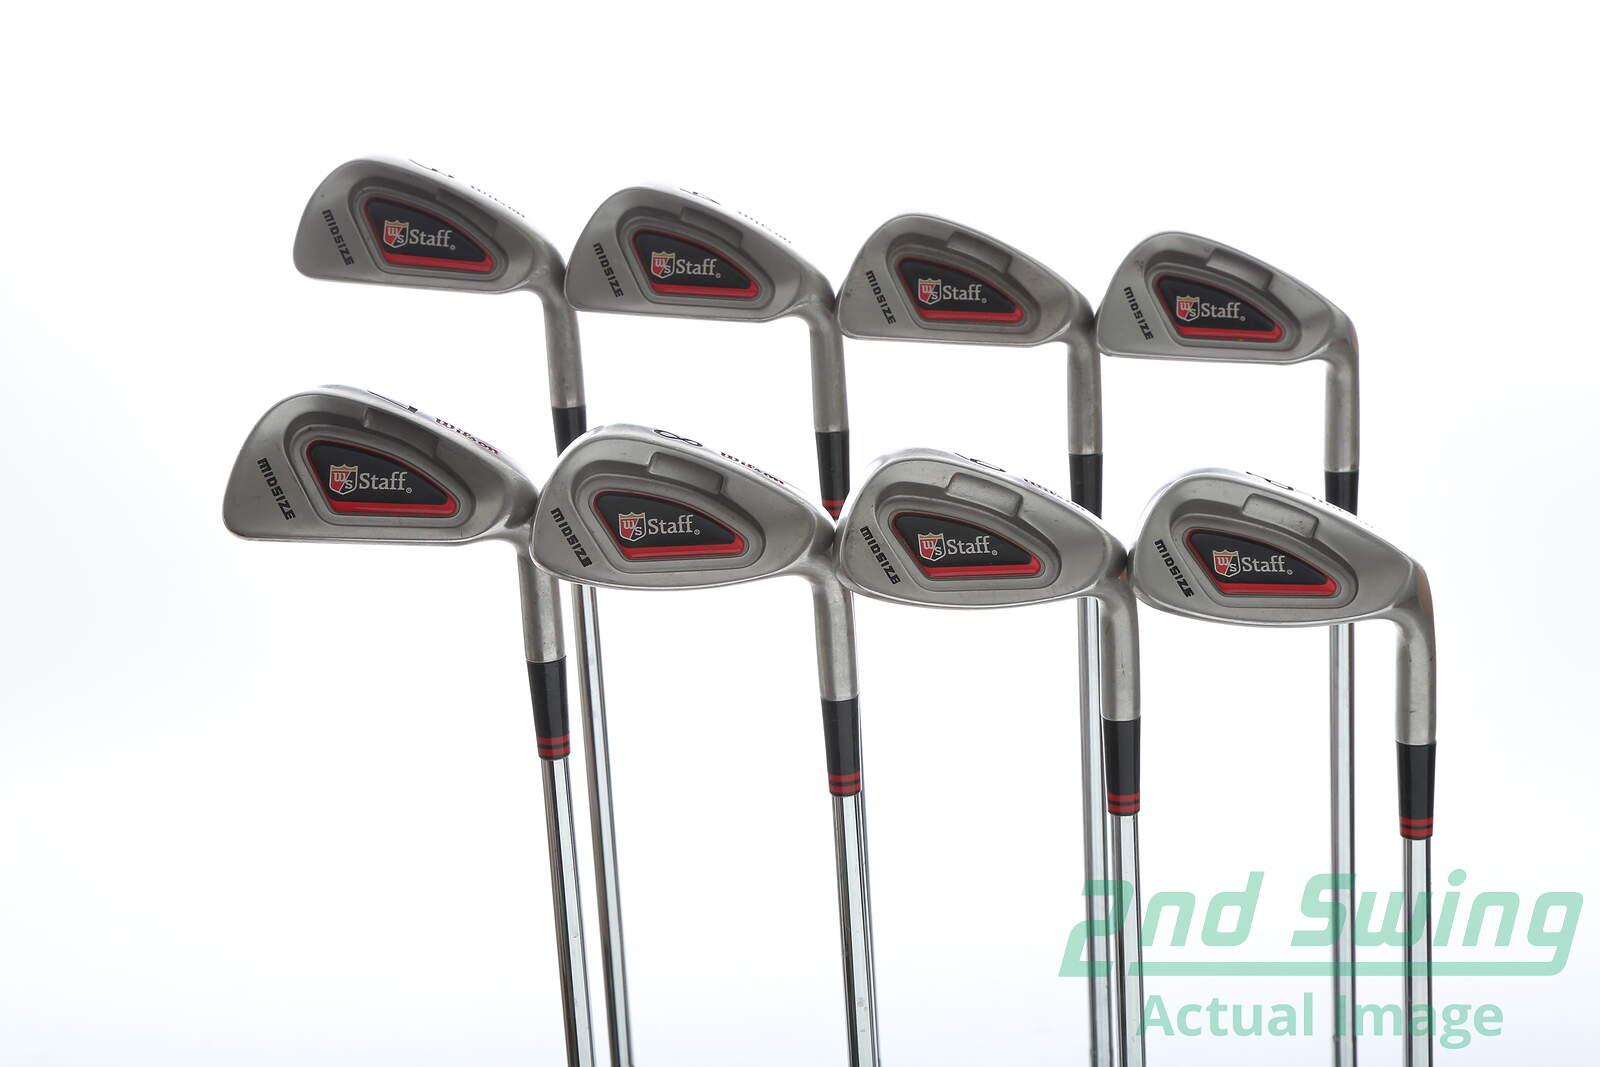 Wilson blackjack 8-piece hybrid iron set